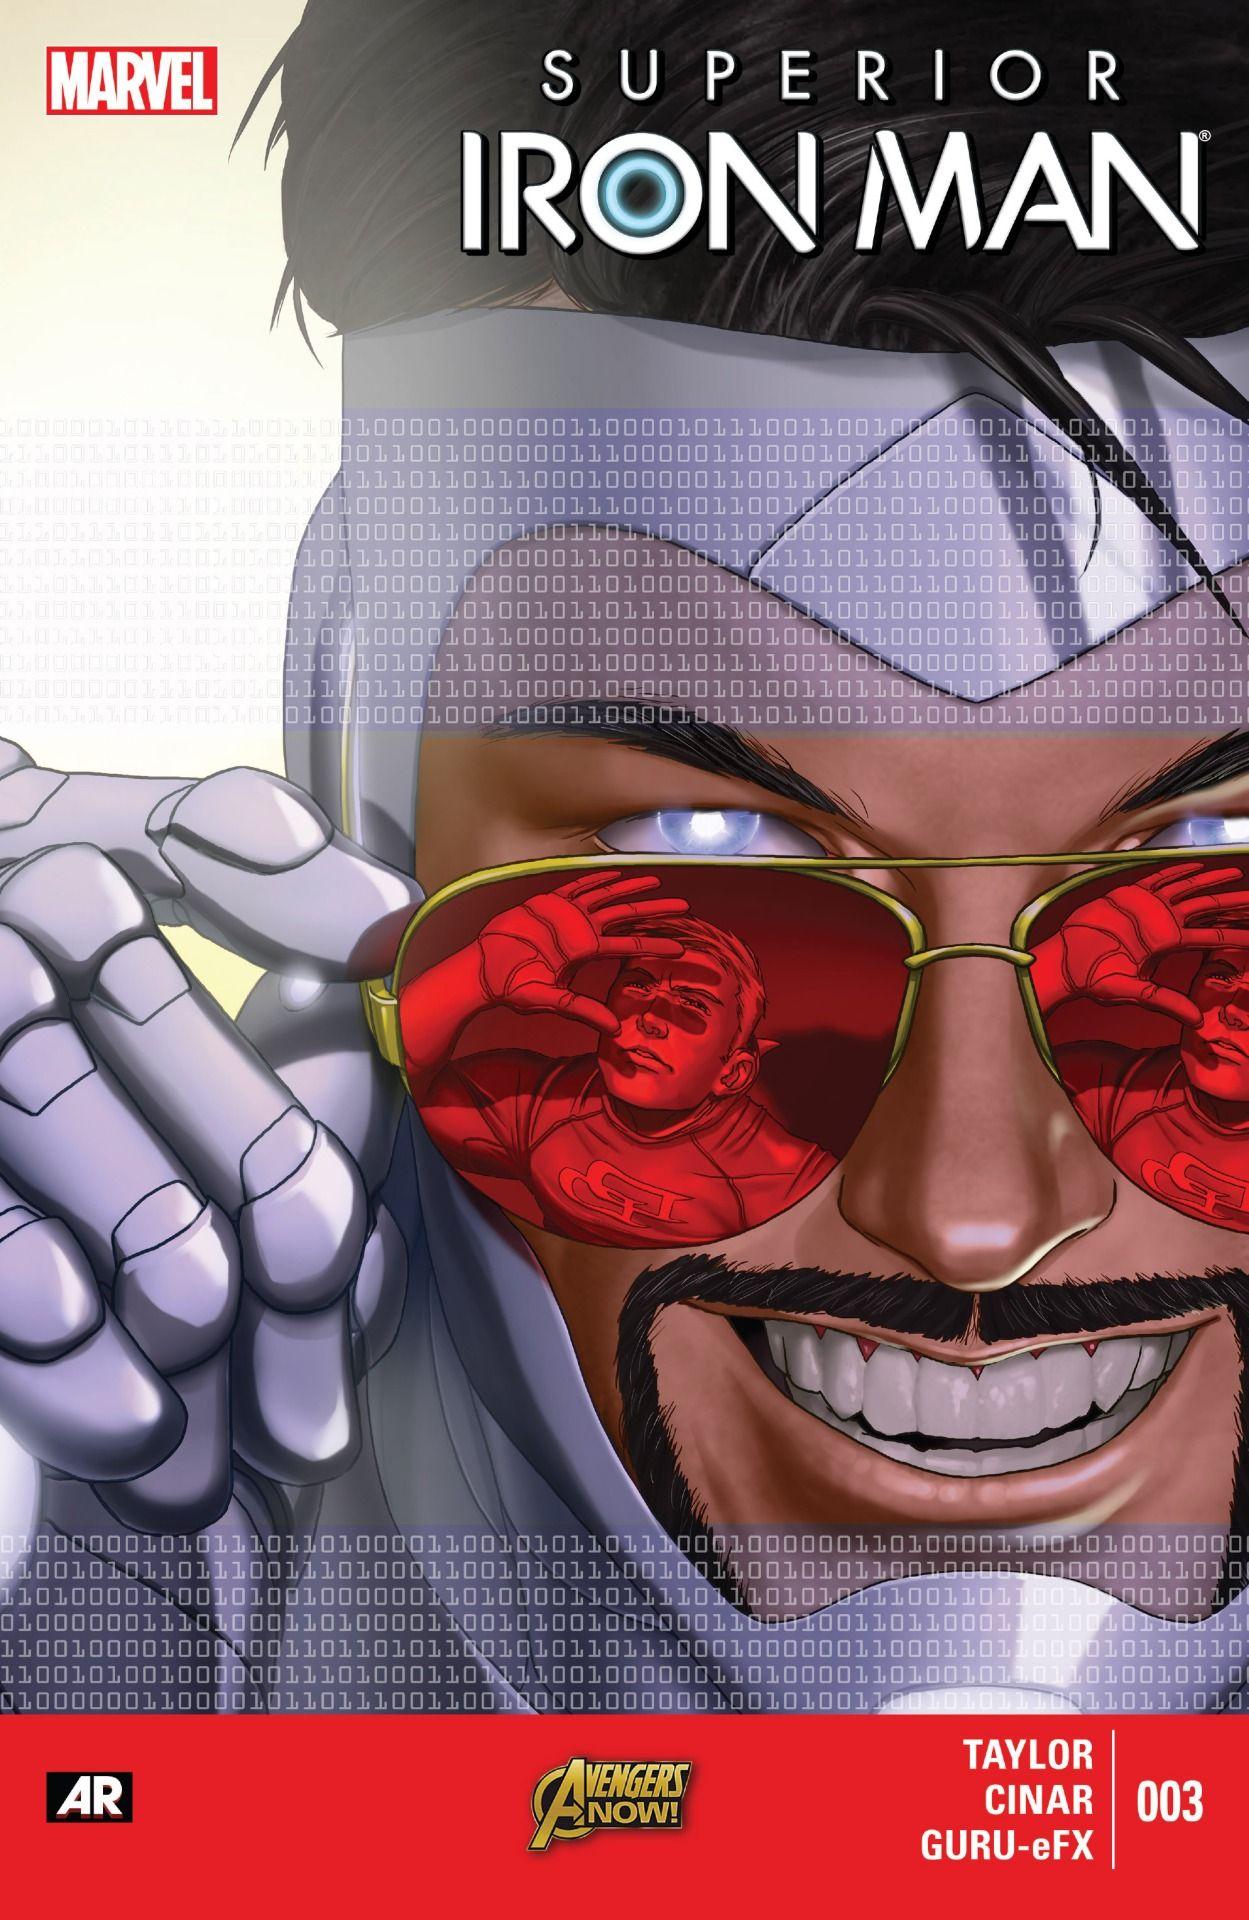 Pin On Marvel Comic Referencias Personajes Peliculas